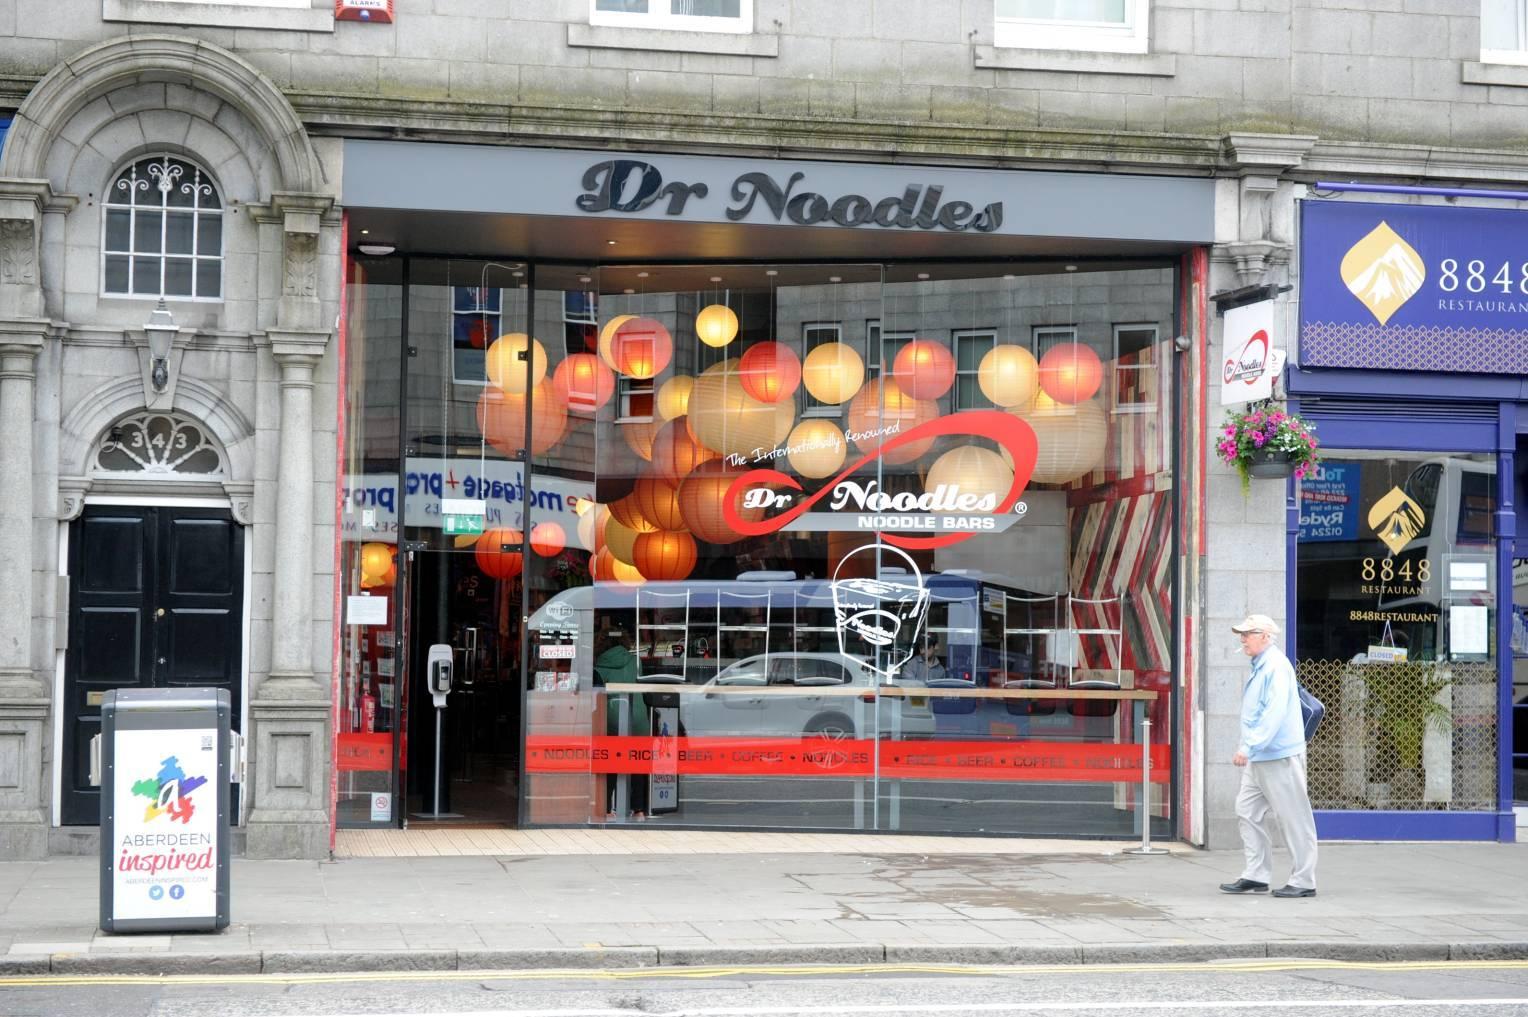 Dr Noodles on Union Street.